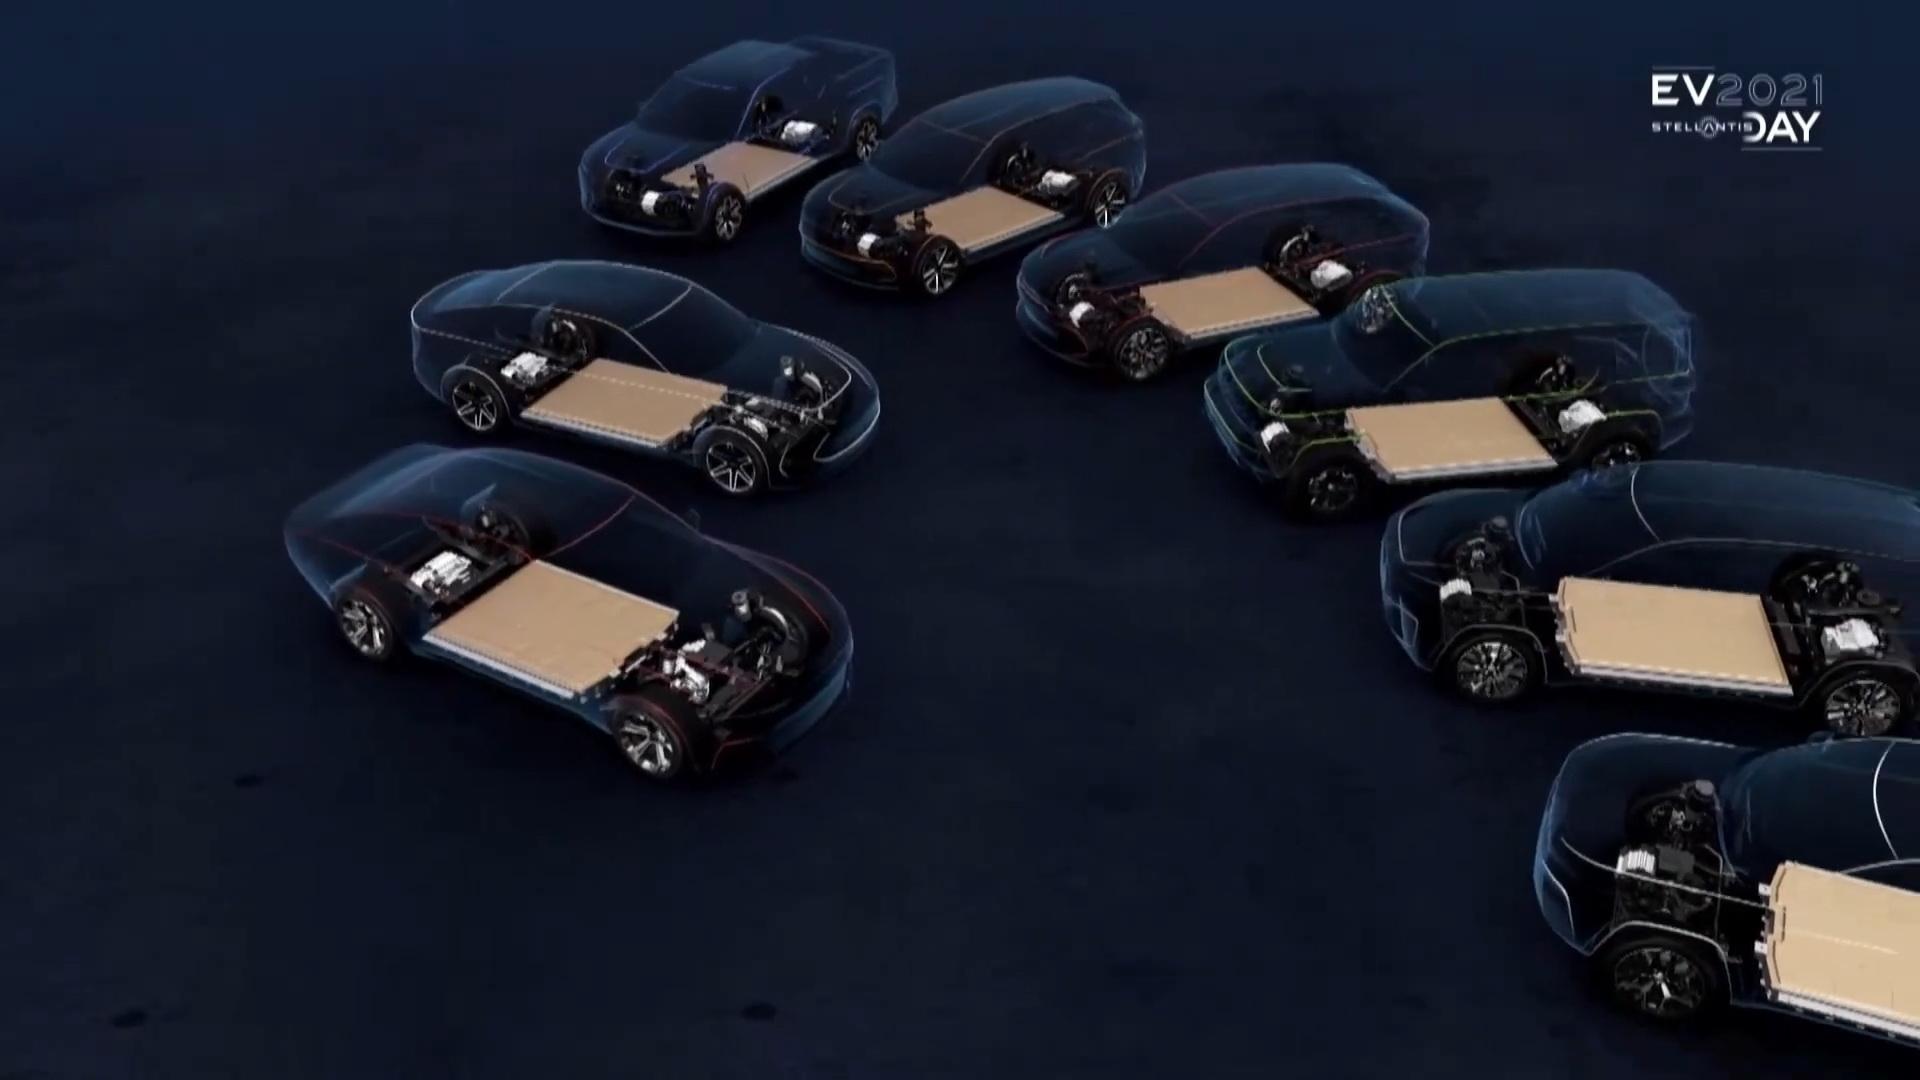 ستيلانتيس - 8 سيارات كهربائية